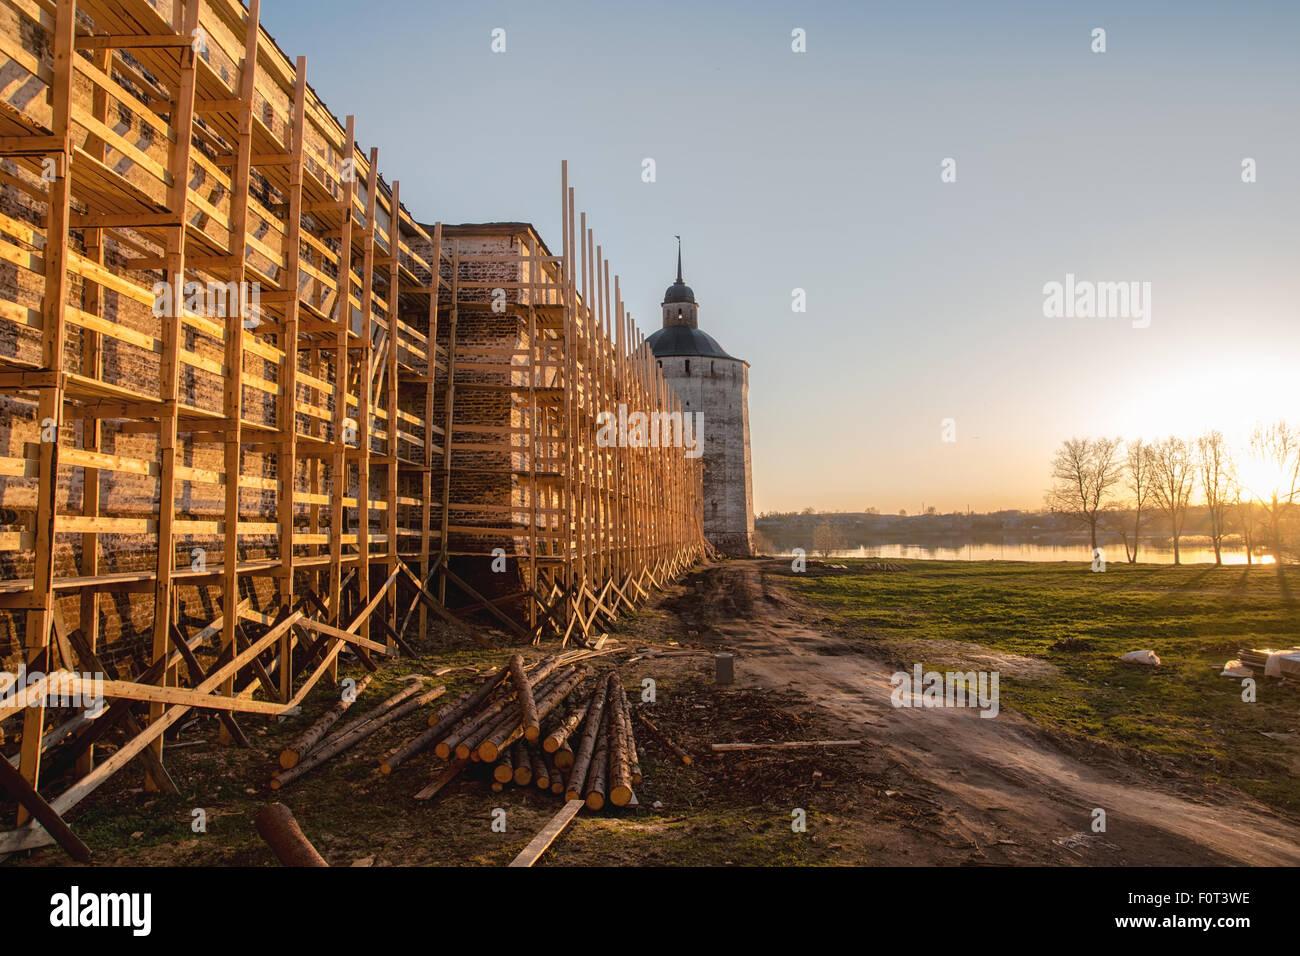 Kirillo-Belozersky Monastery. Reconstruction works - Stock Image